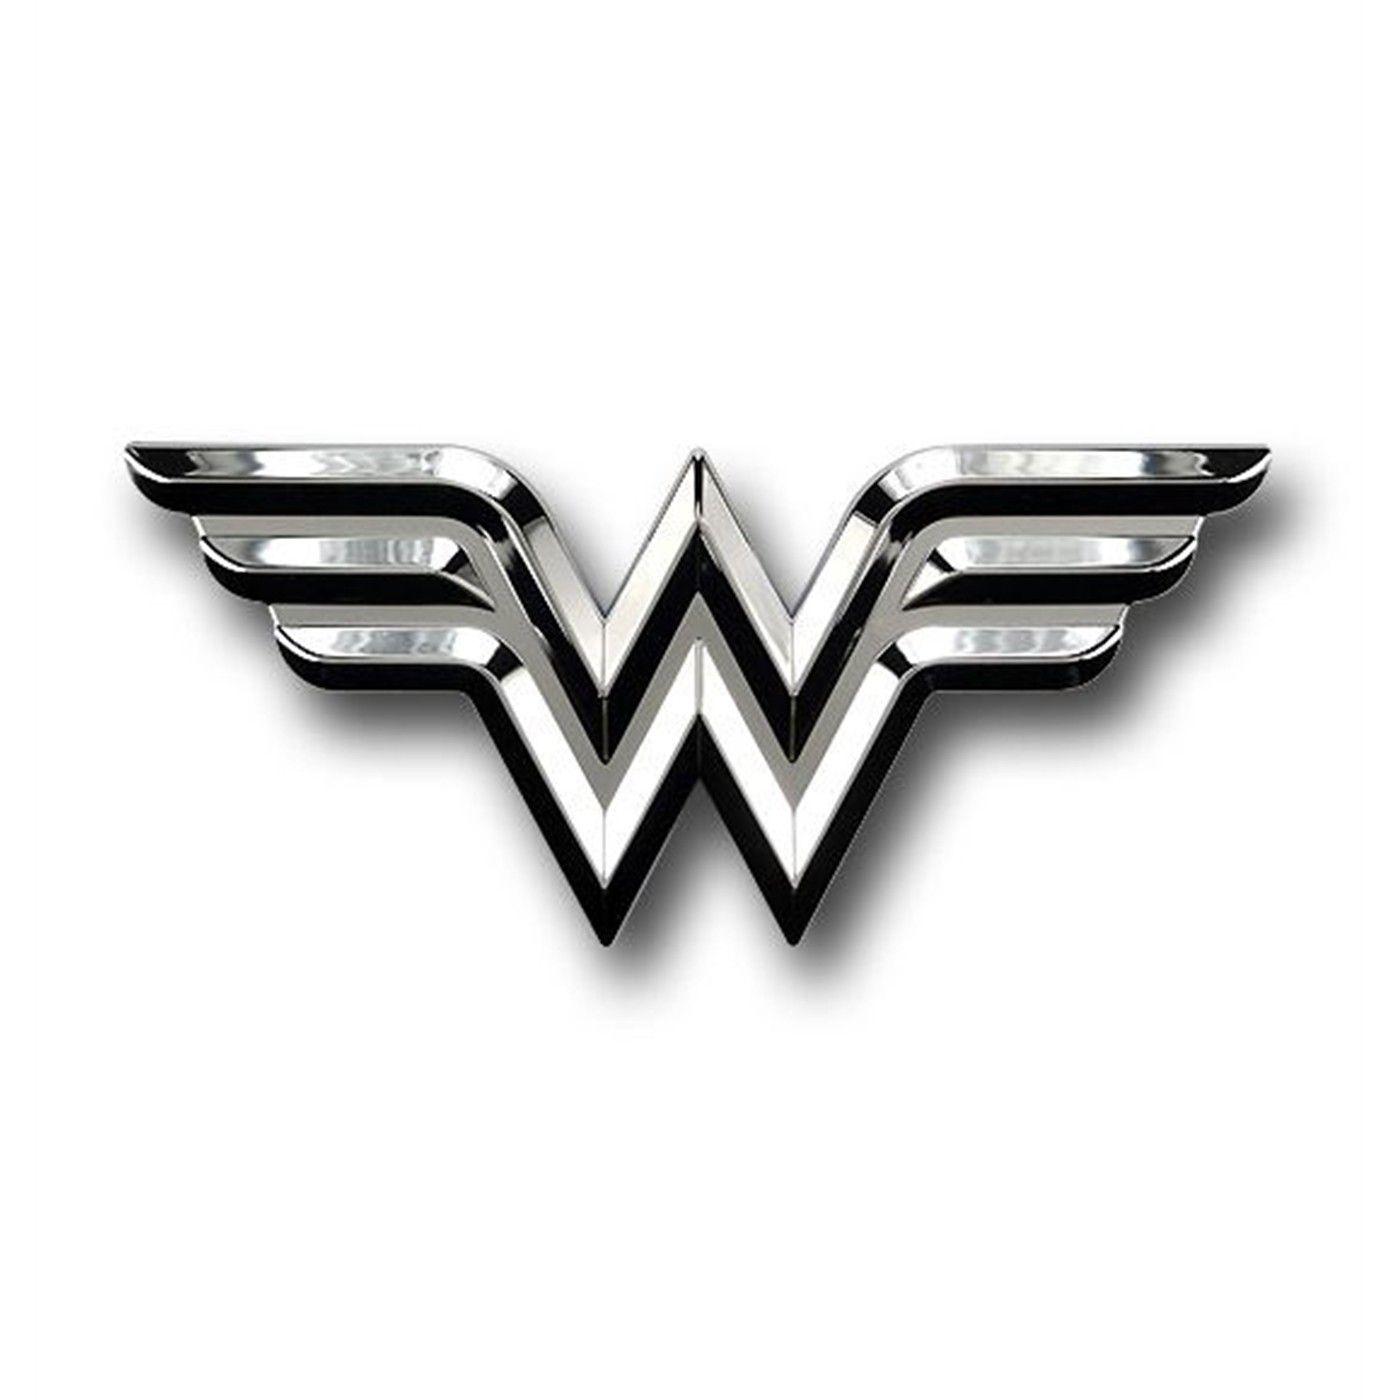 Wonder Woman Chrome Symbol Car Emblem Car Emblem Wonder Woman Tattoo Symbols [ 1400 x 1400 Pixel ]